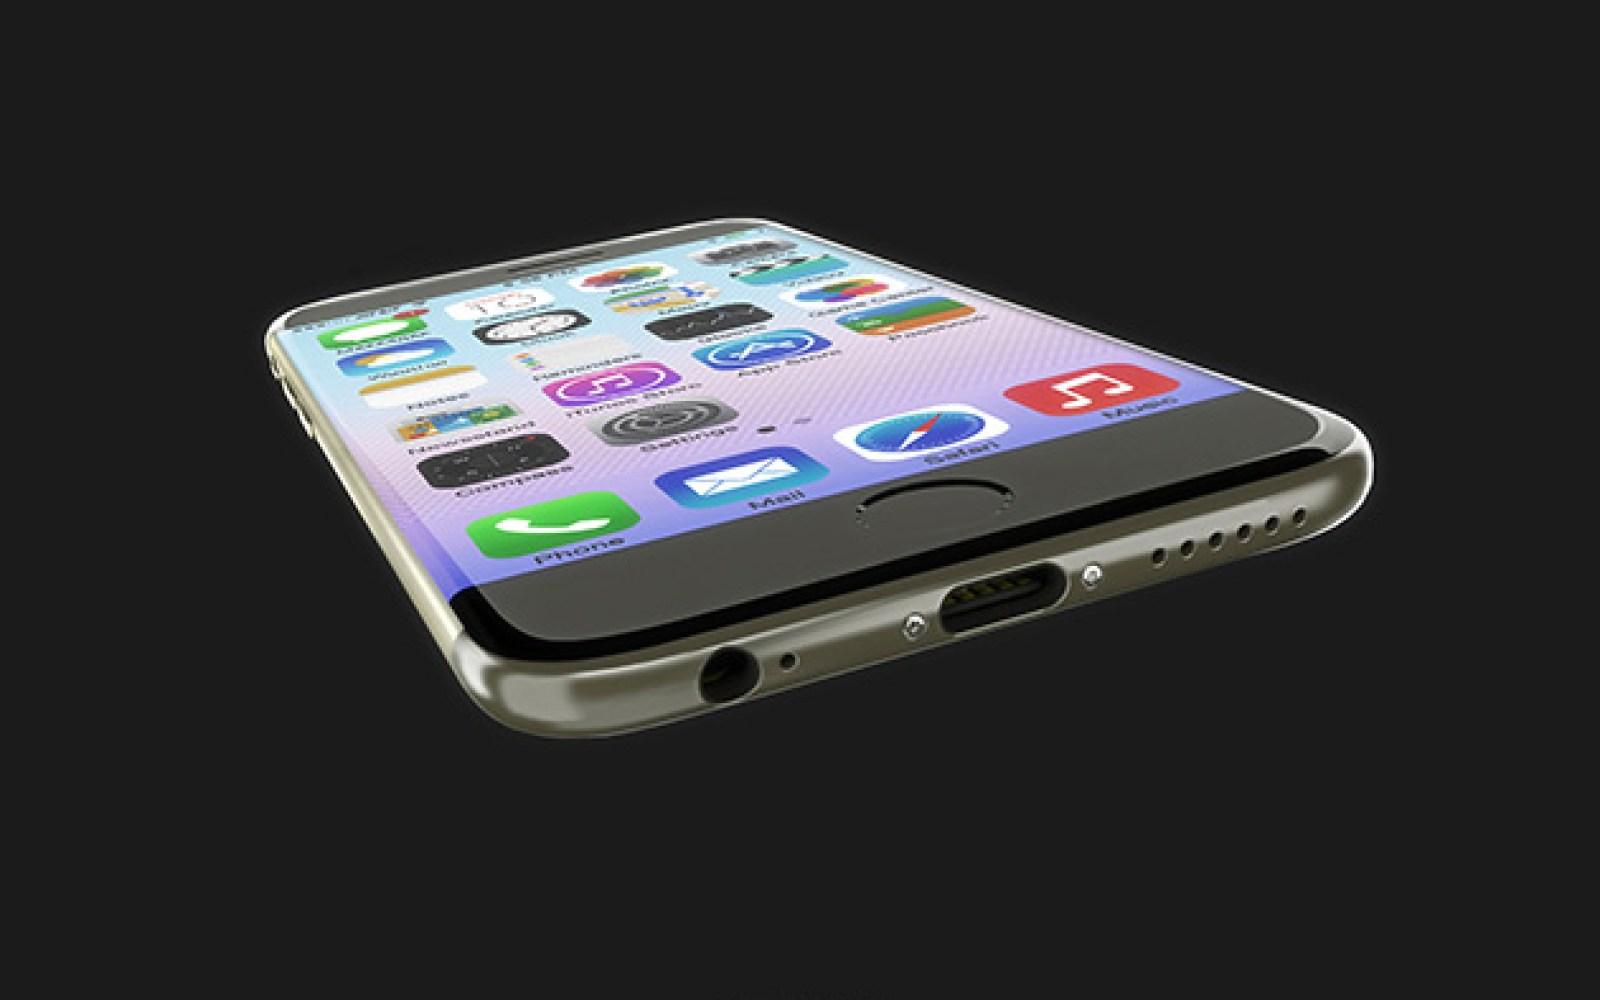 The latest iPhone 6 design renders from Ukraine